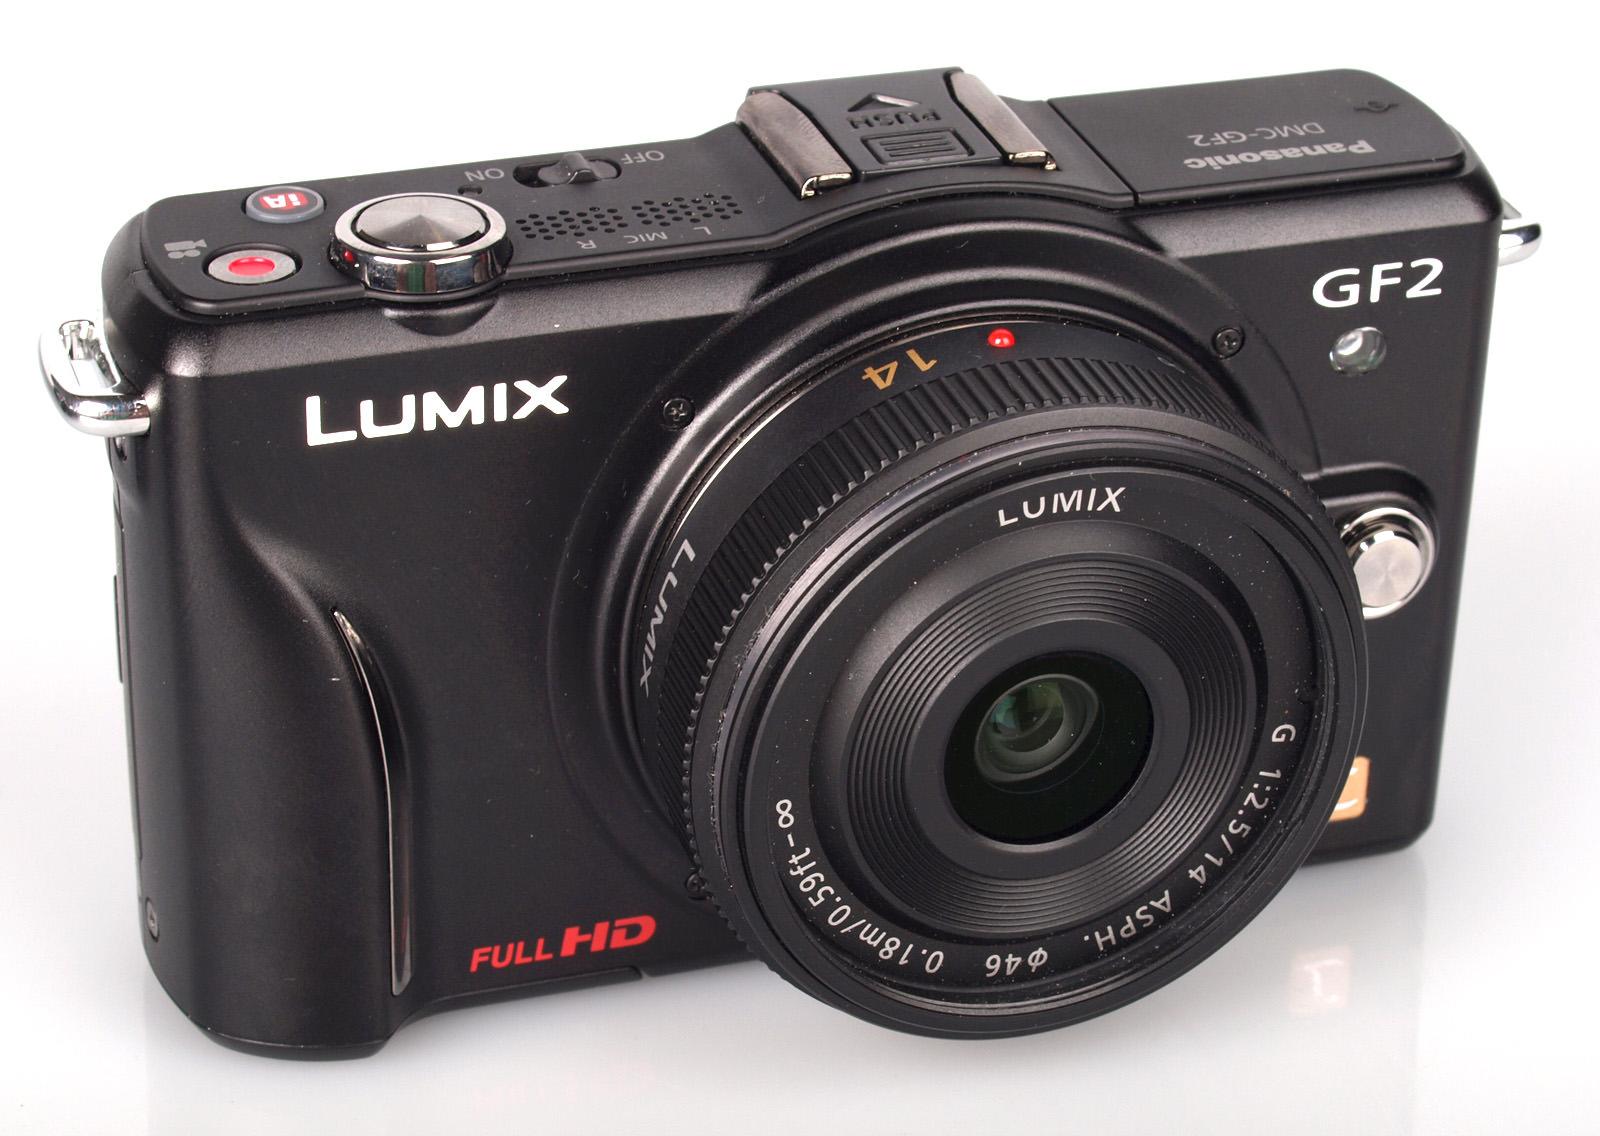 panasonic lumix dmc gf2 mirrorless csc review rh ephotozine com Panasonic Lumix Leica Panasonic Lumix Digital Camera